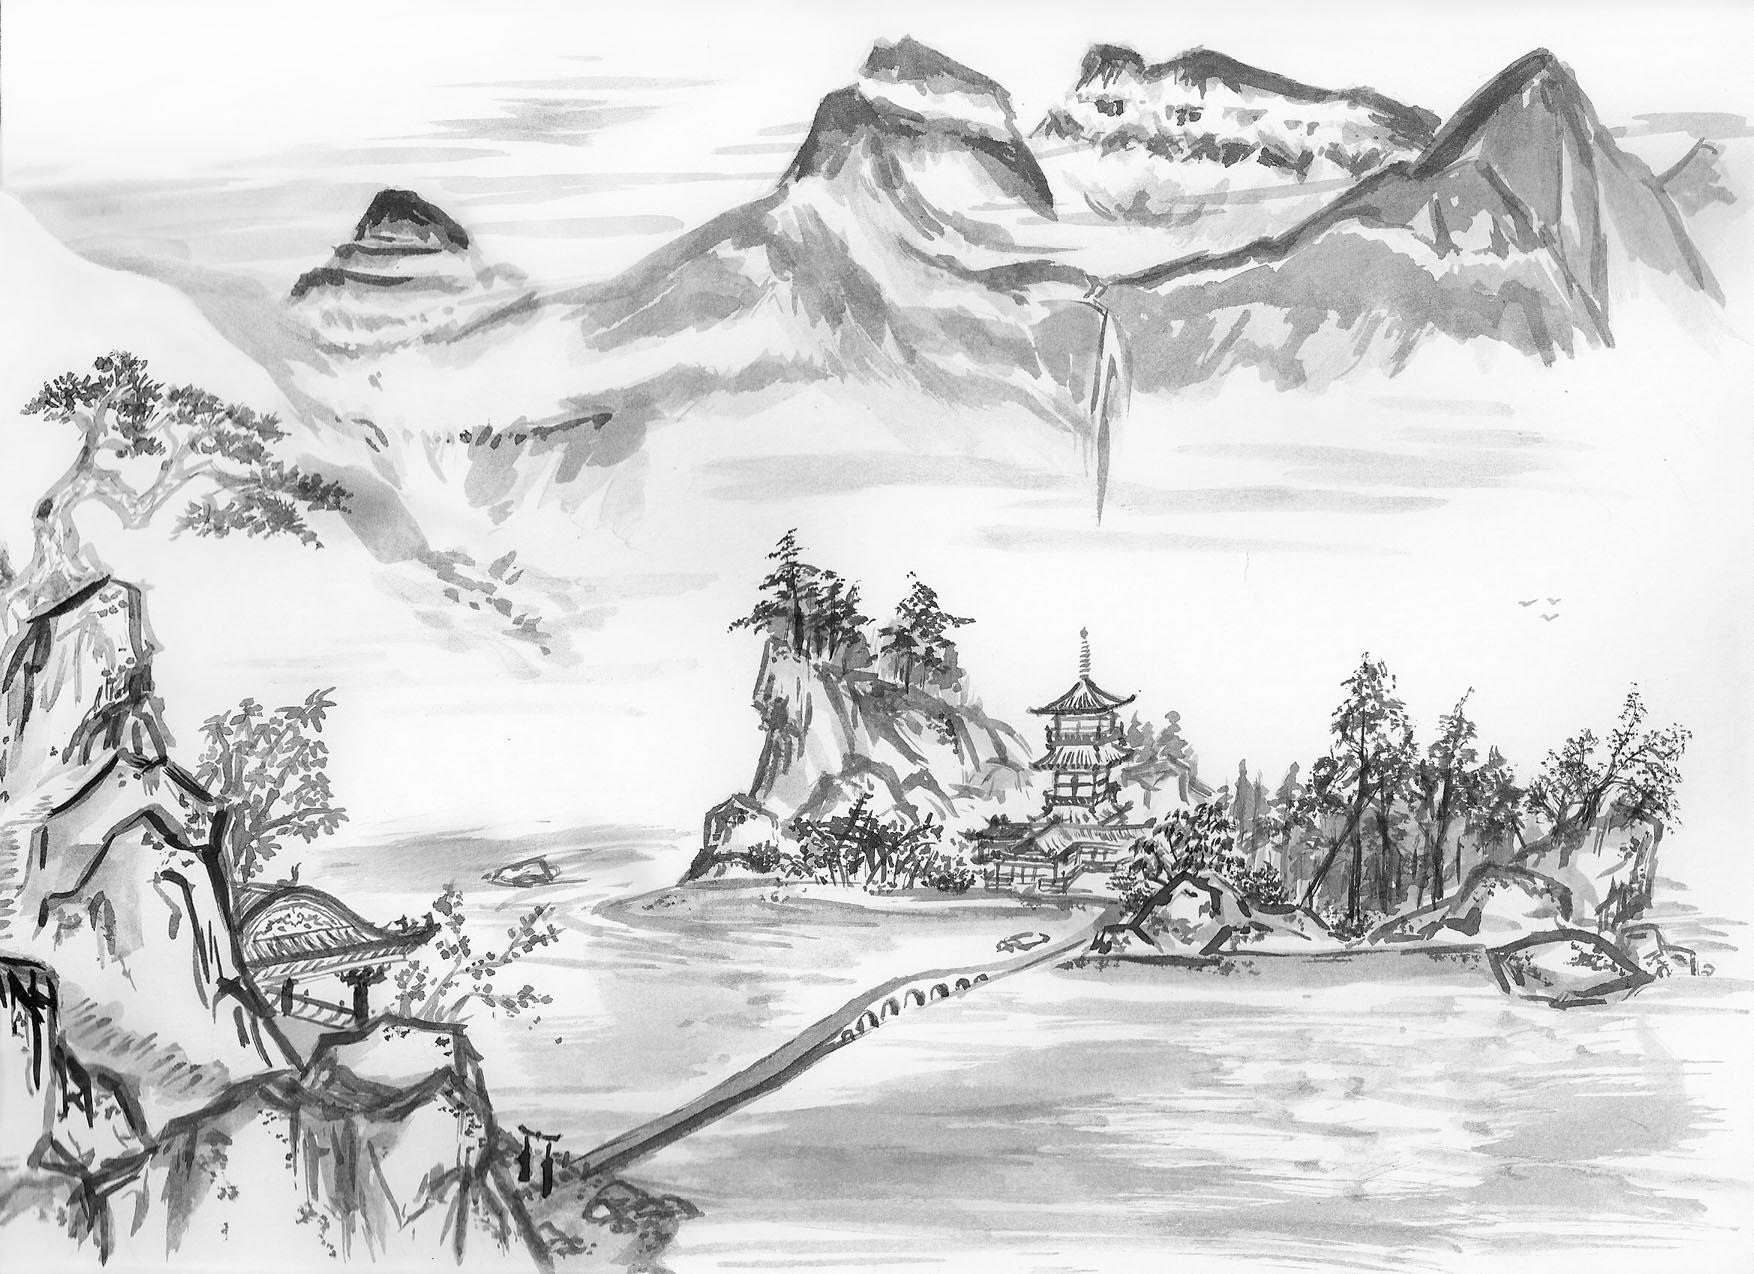 sumi e mountain landscape by babakosen on deviantart